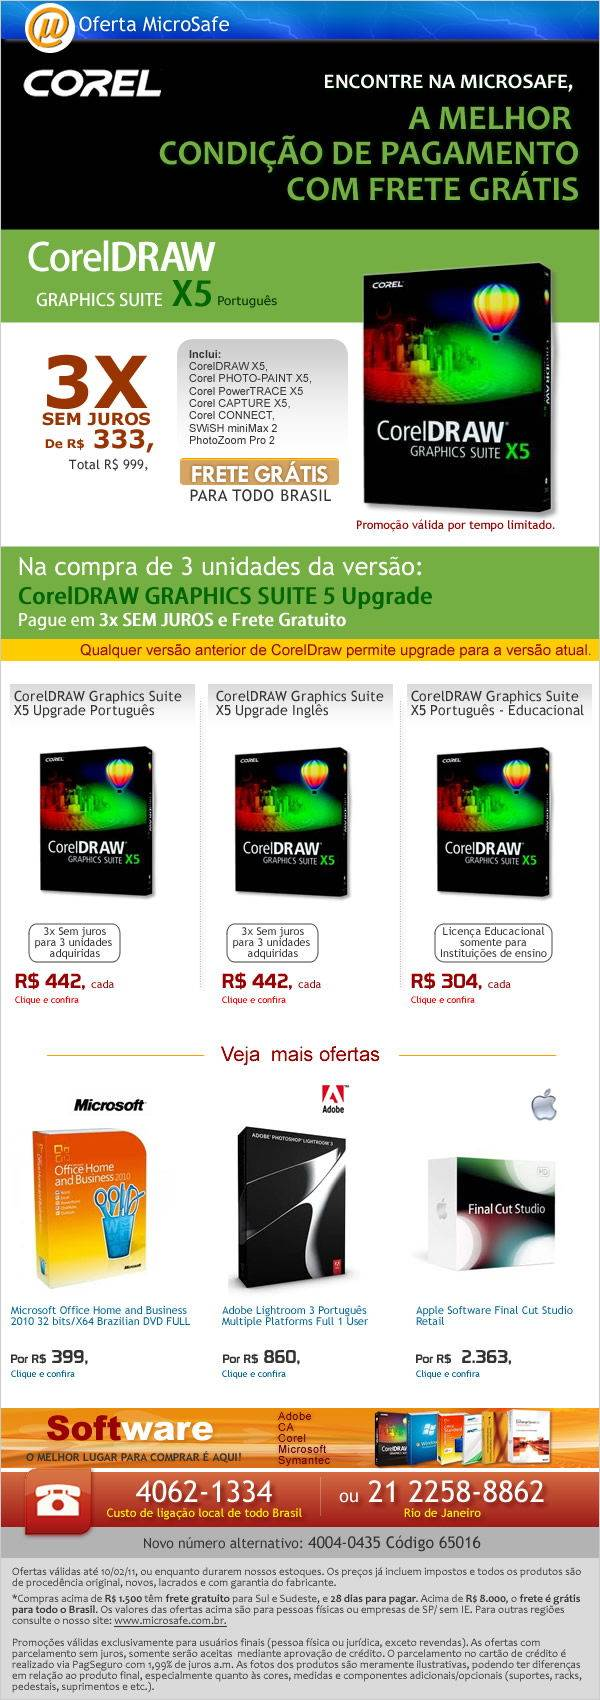 Na MicroSafe - CorelDRAW X5 em 3x Sem Juros e Frete Gr�tis para todo Brasil!